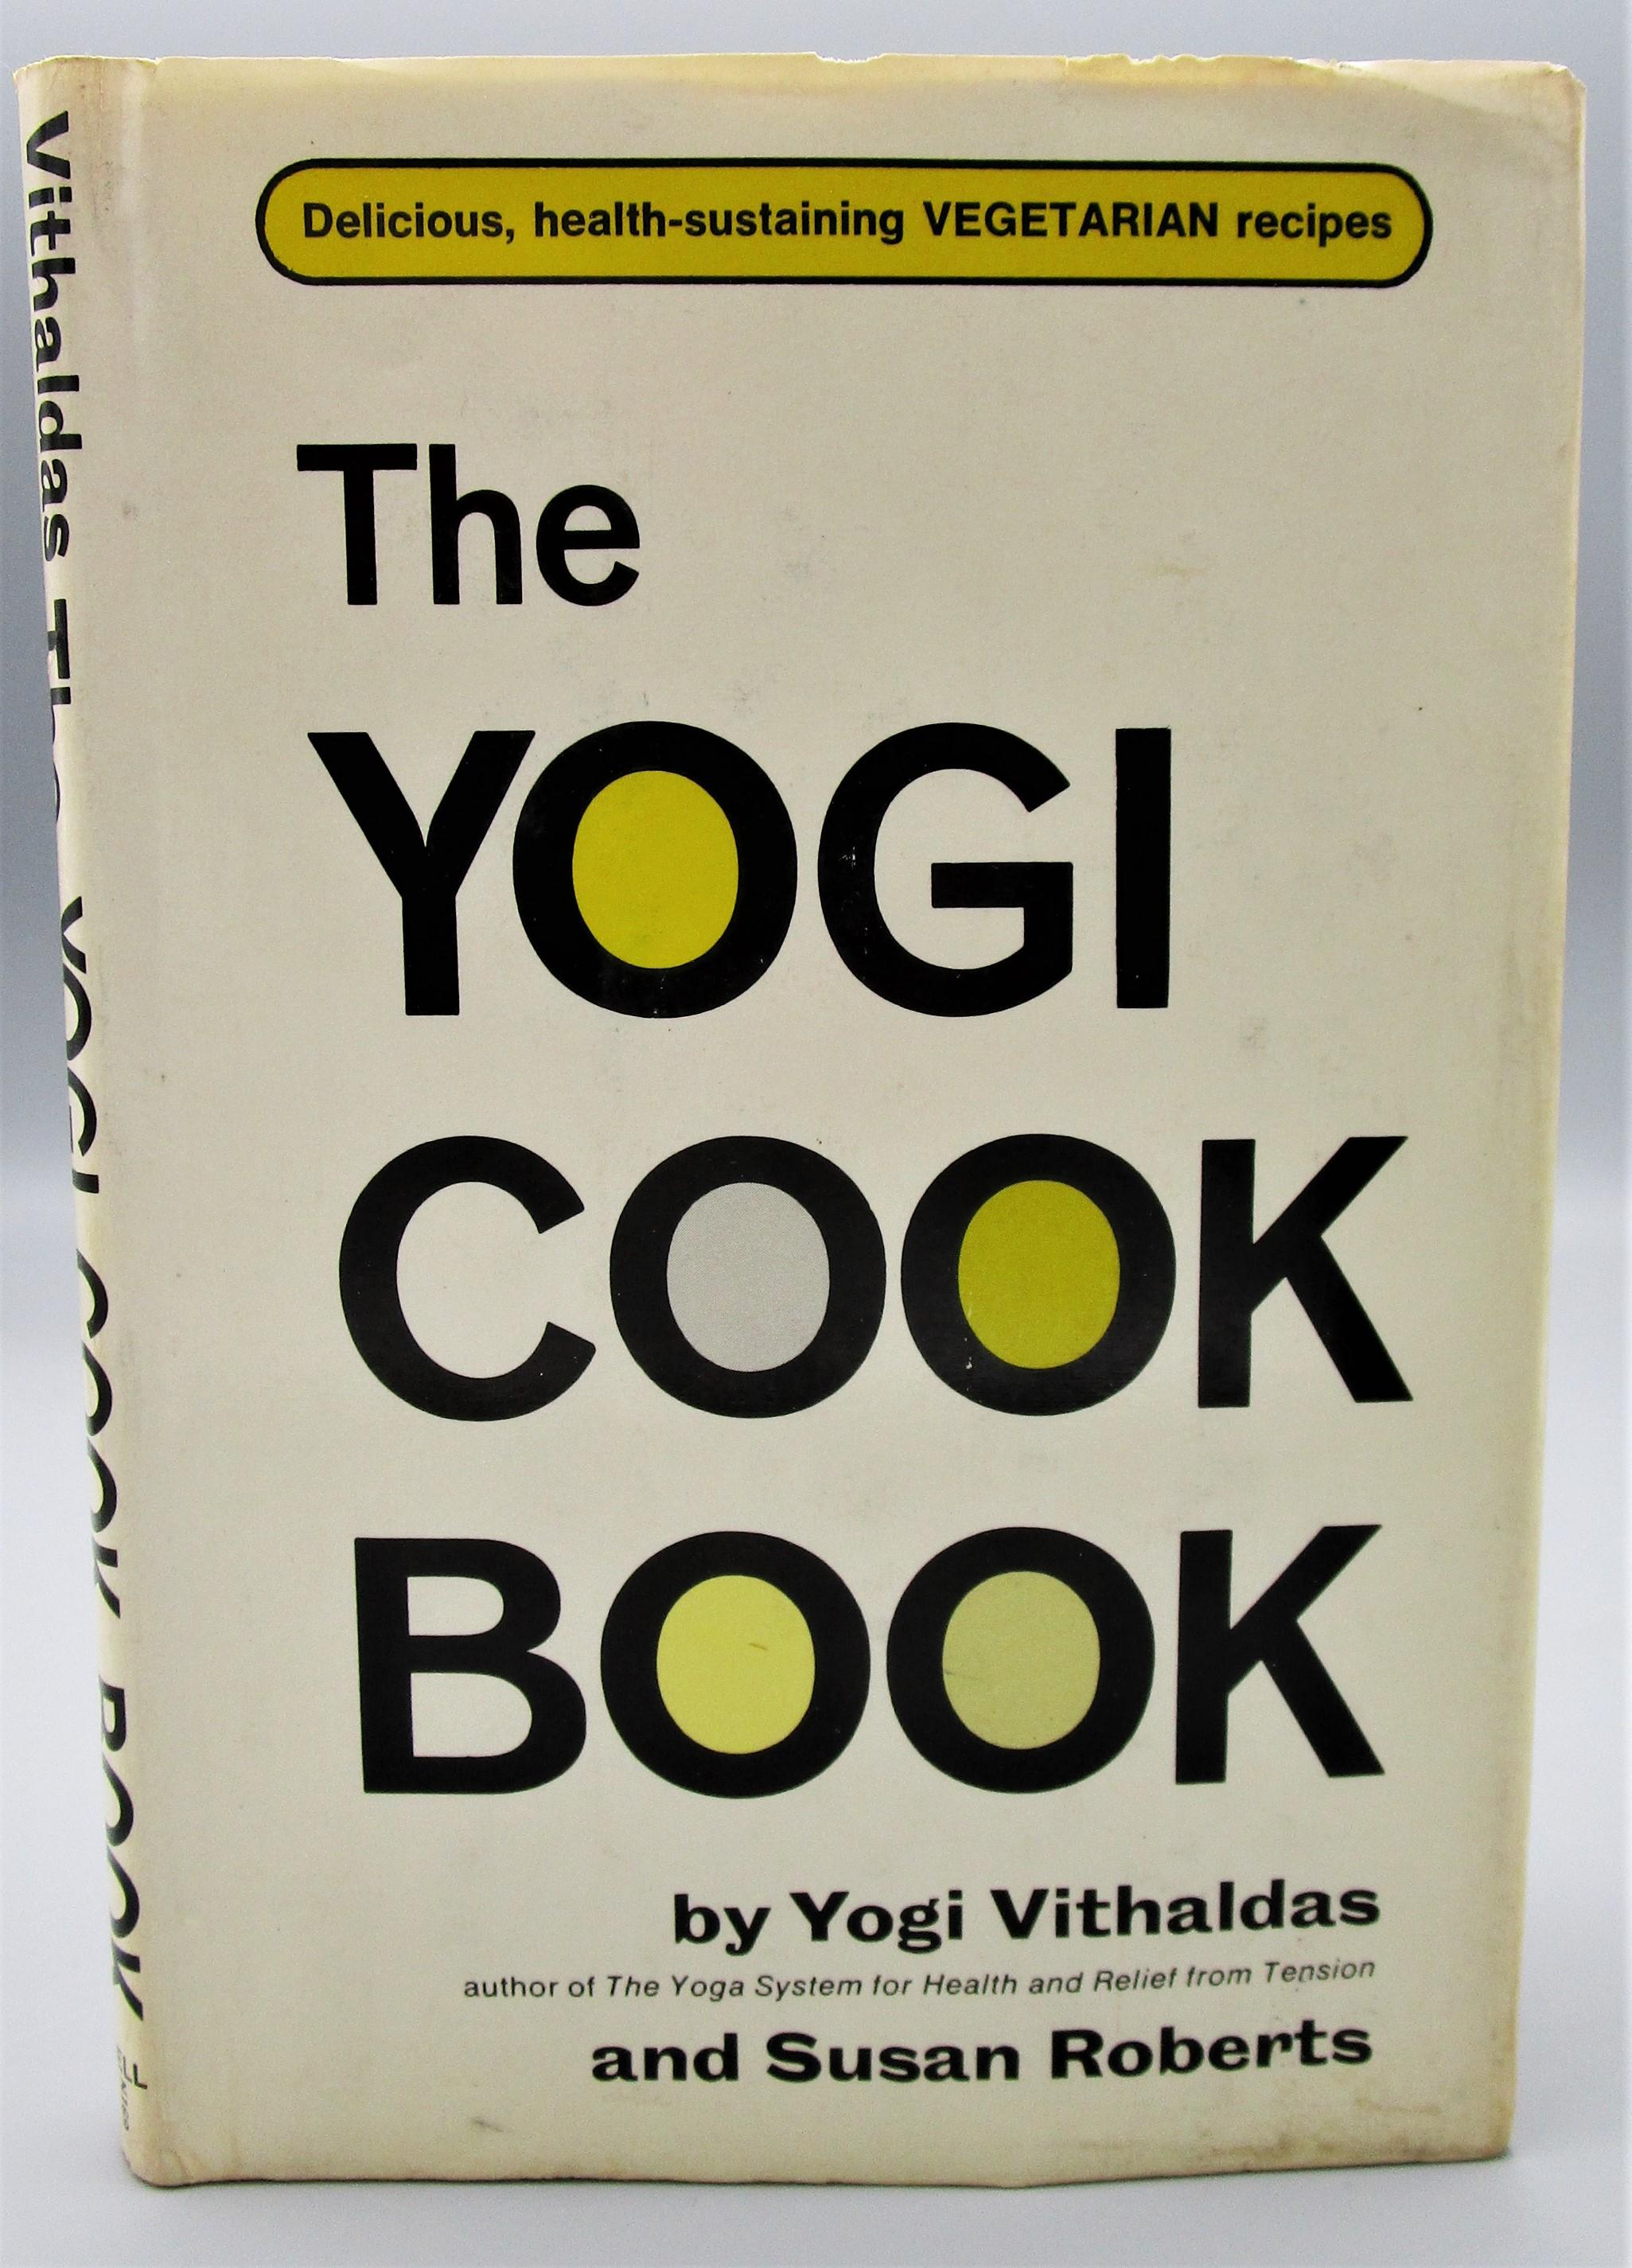 THE YOGI COOK BOOK, by Yogi Vithaldas & Susan Roberts - 1968